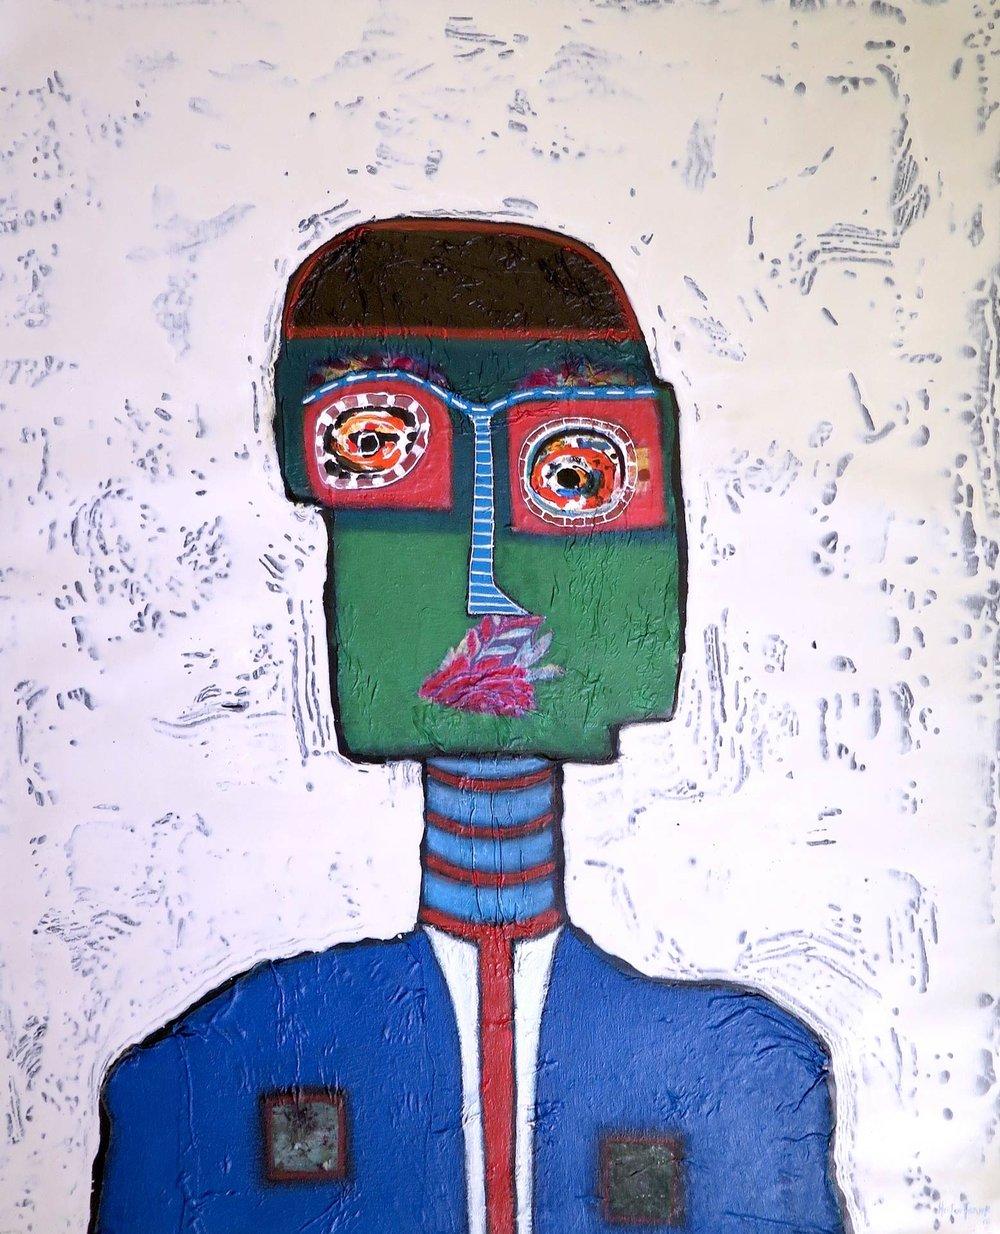 bryant-toth-fine-art-hector-frank-exhibition-8.jpg